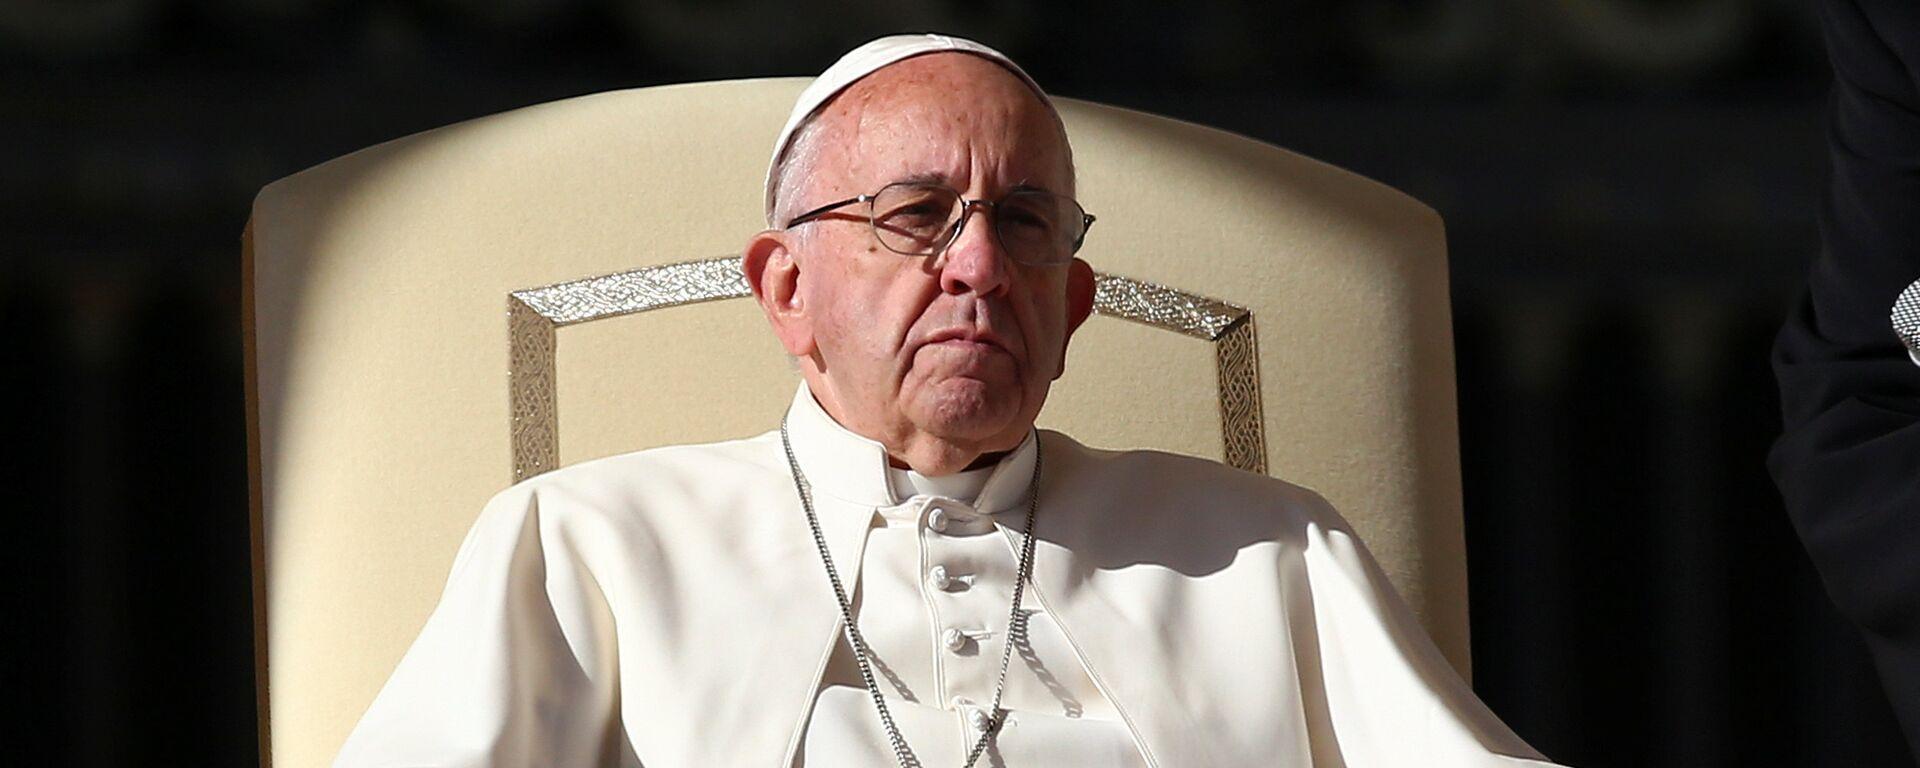 El papa Francisco - Sputnik Mundo, 1920, 01.03.2021